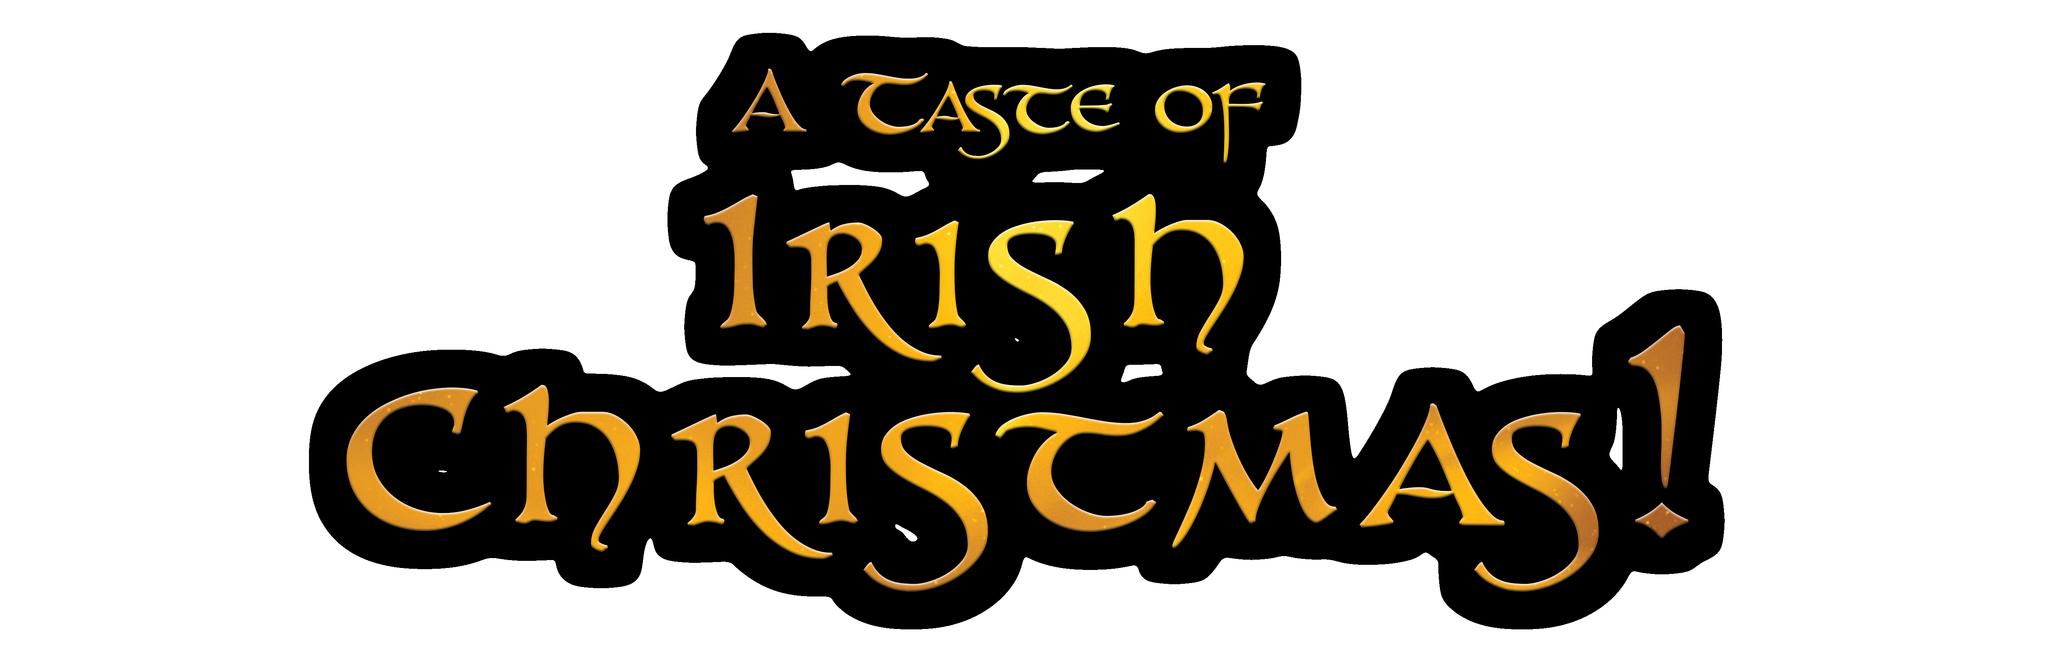 A Taste Of Irish Christmas: Outix